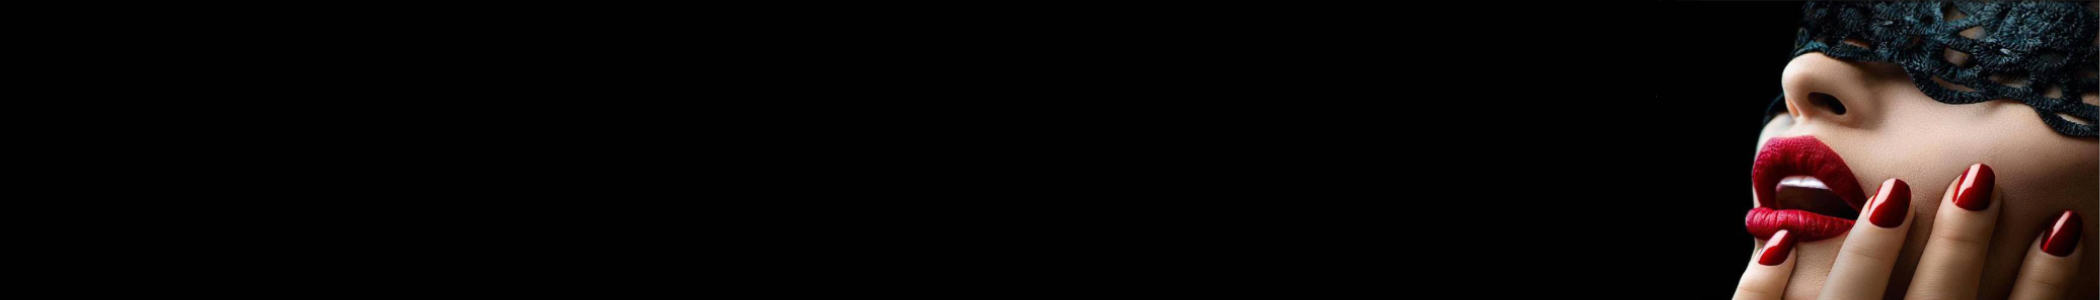 962-805bfd24.jpg